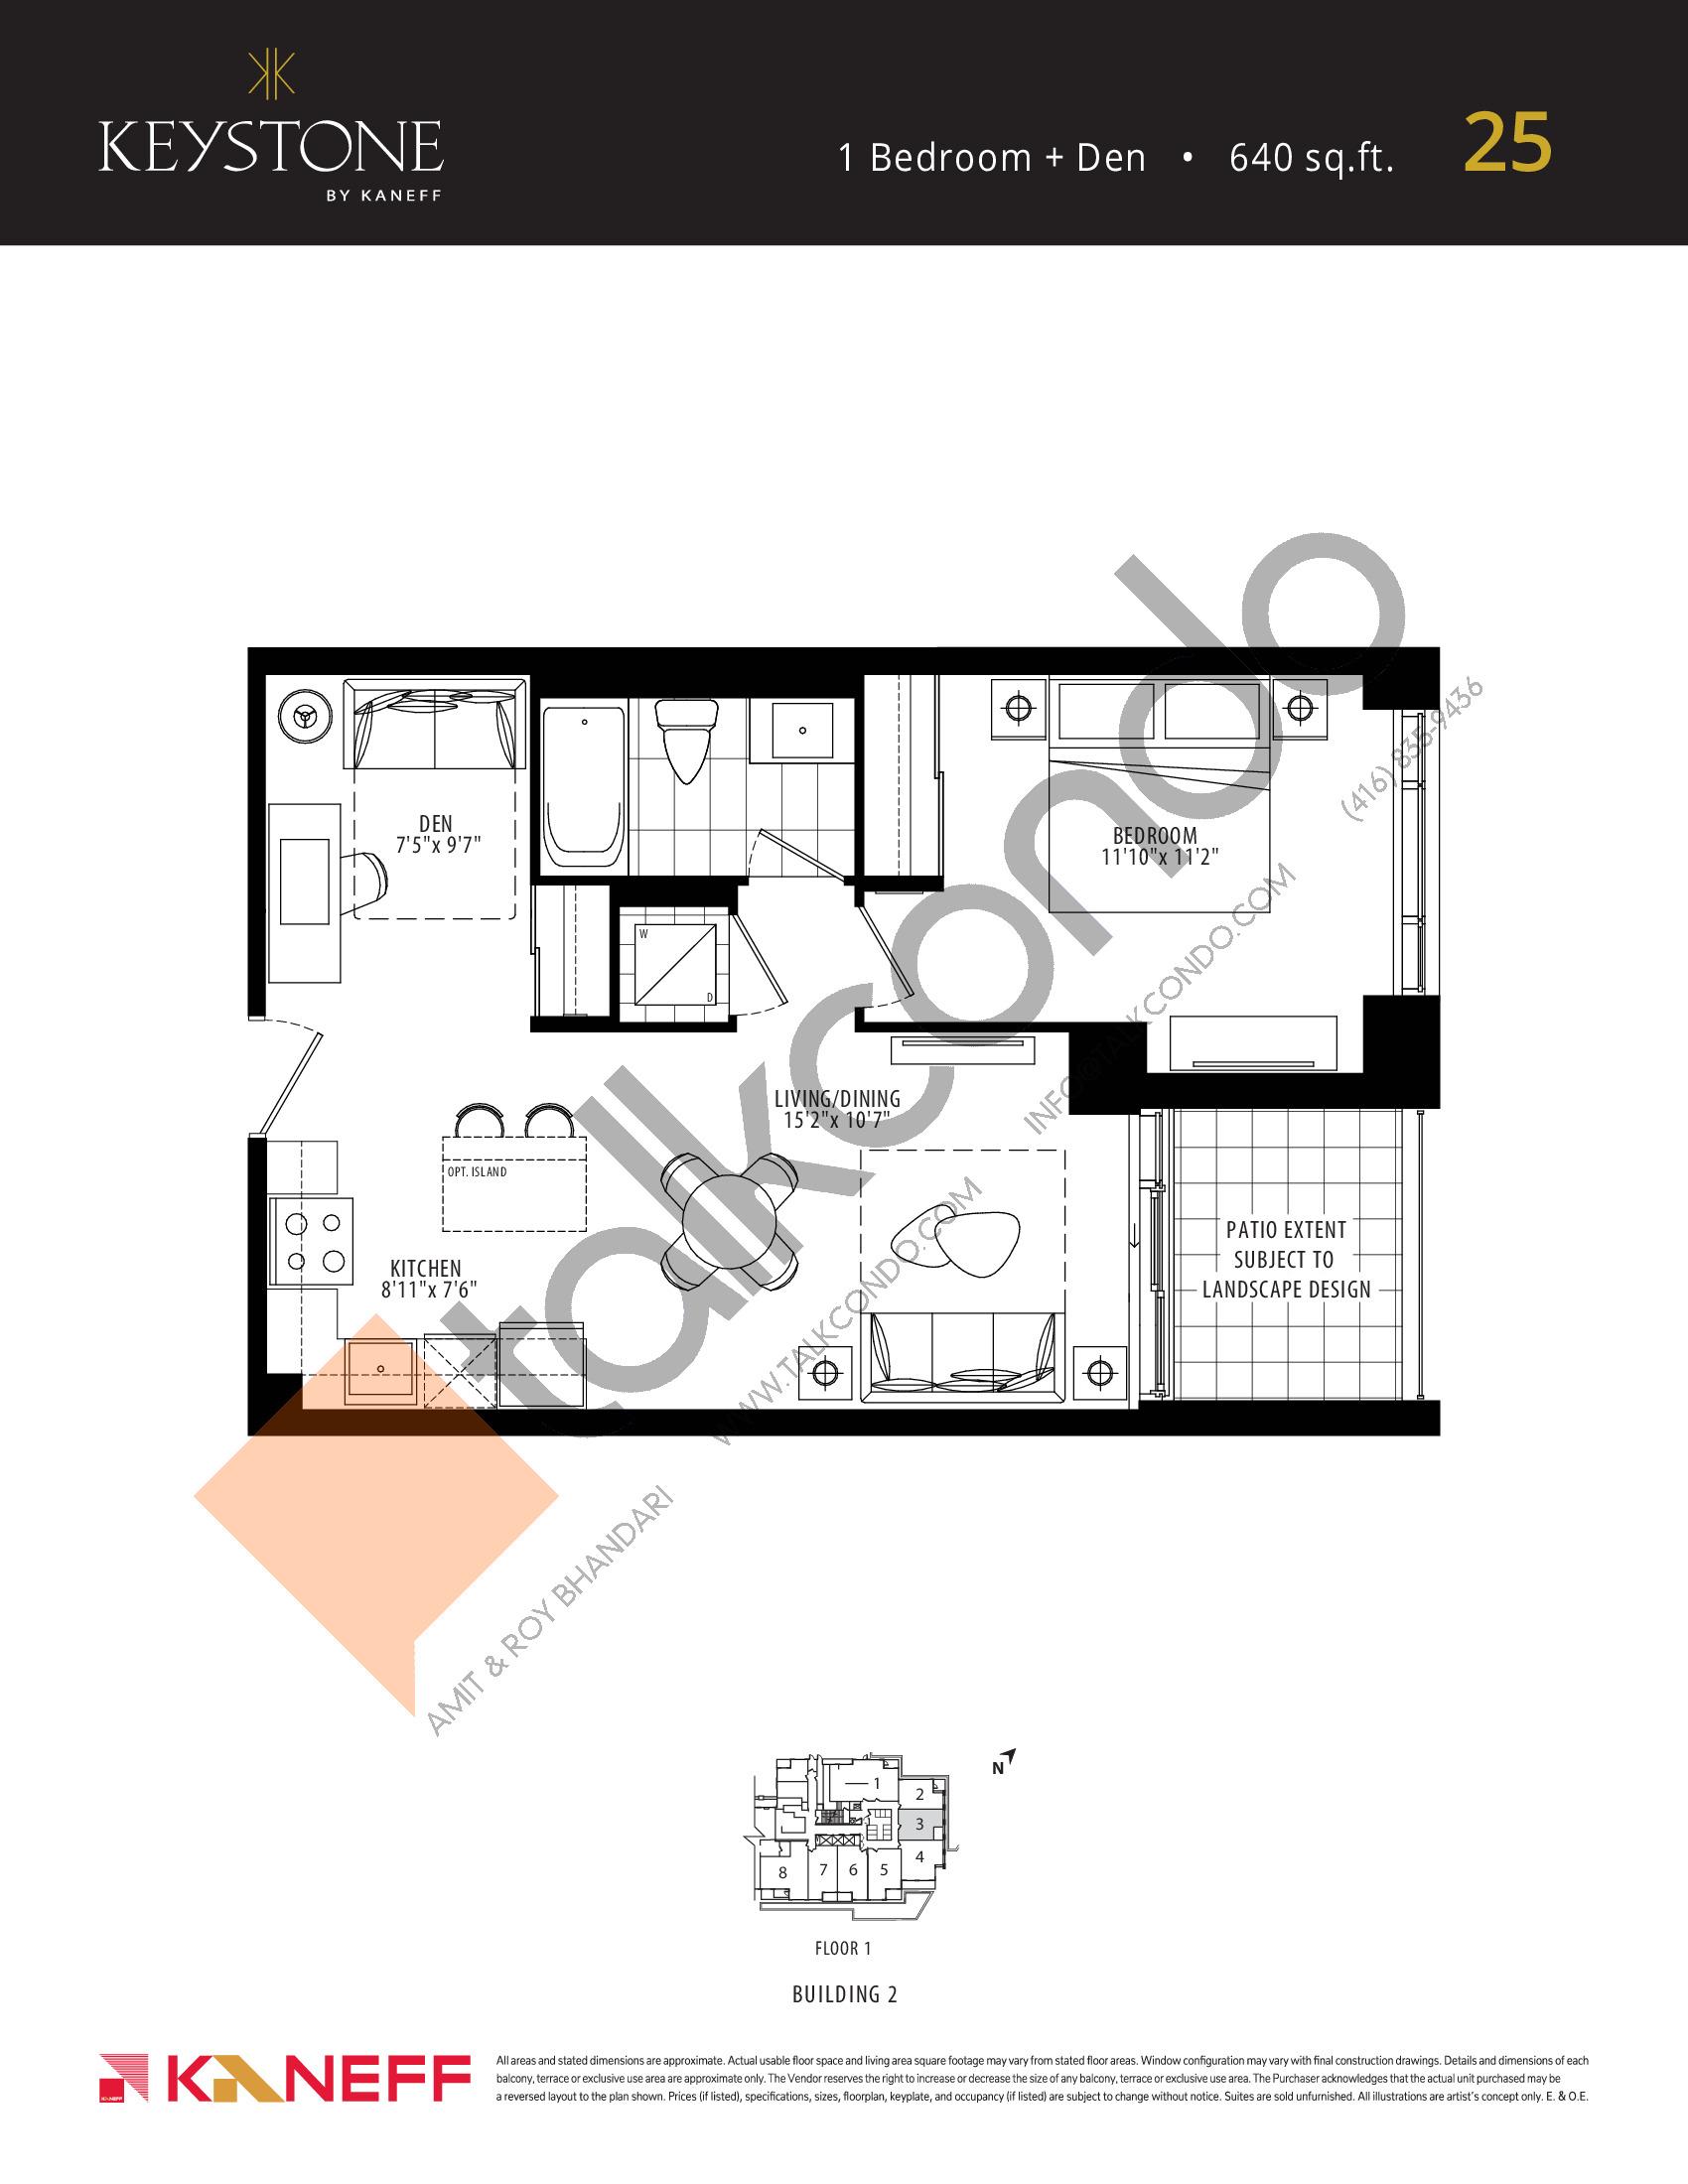 25 Floor Plan at Keystone Condos Phase 2 - 640 sq.ft